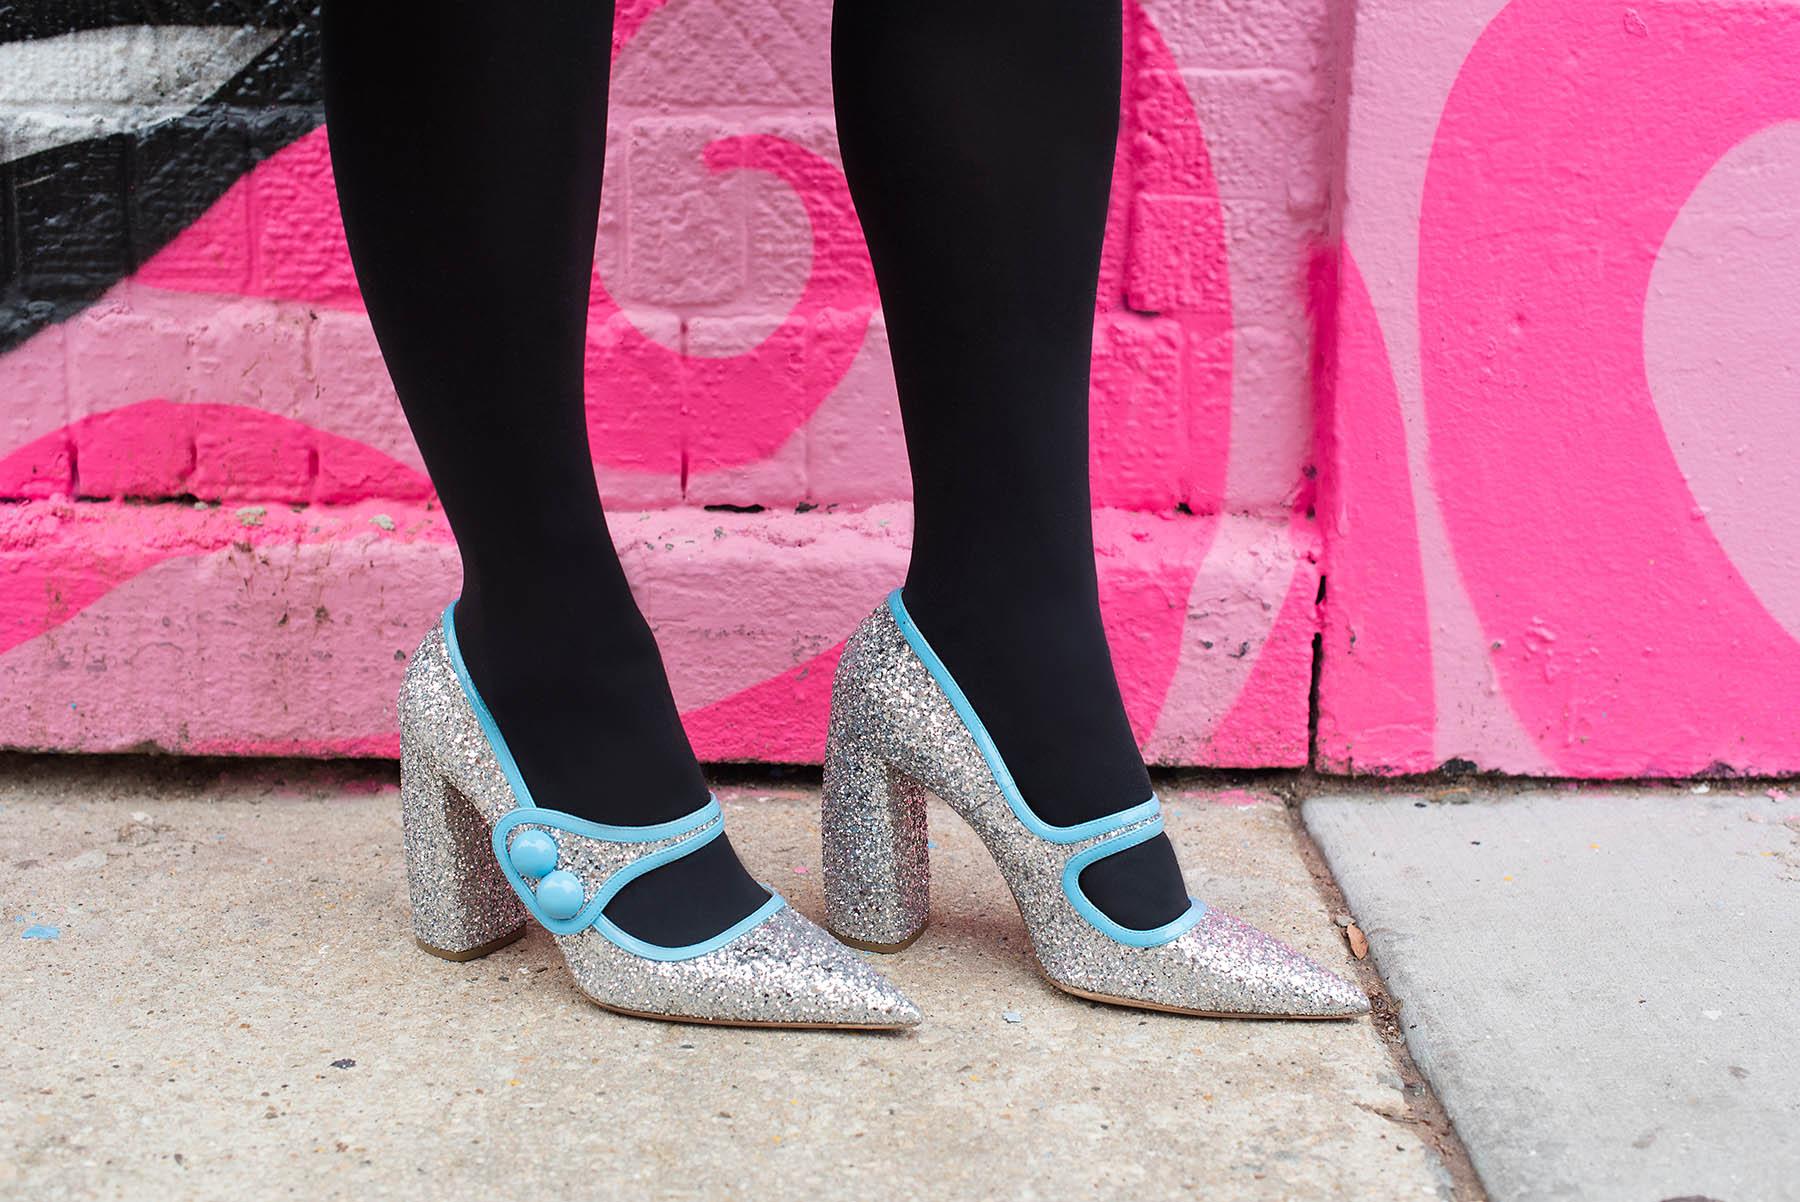 Anna Roufos Sosa wearing Kenzo x HM and Miu Miu Glitter Heels.